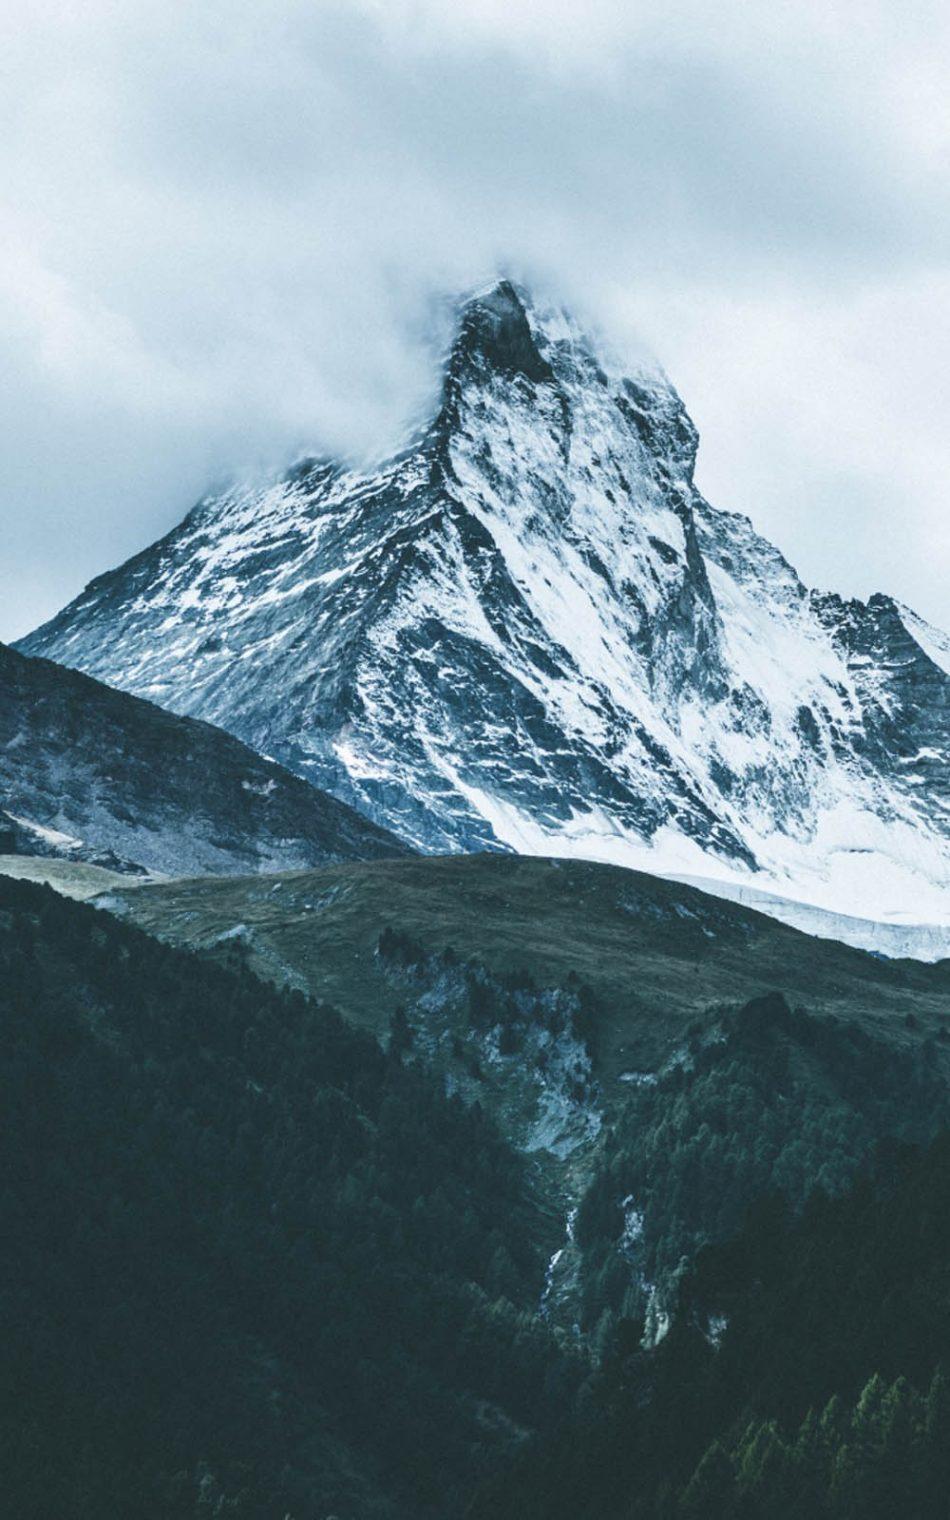 Best Wallpaper Mountain Morning - Morning-Foggy-Mountain-HD-Mobile-Wallpaper-950x1520  Collection_654662.jpg